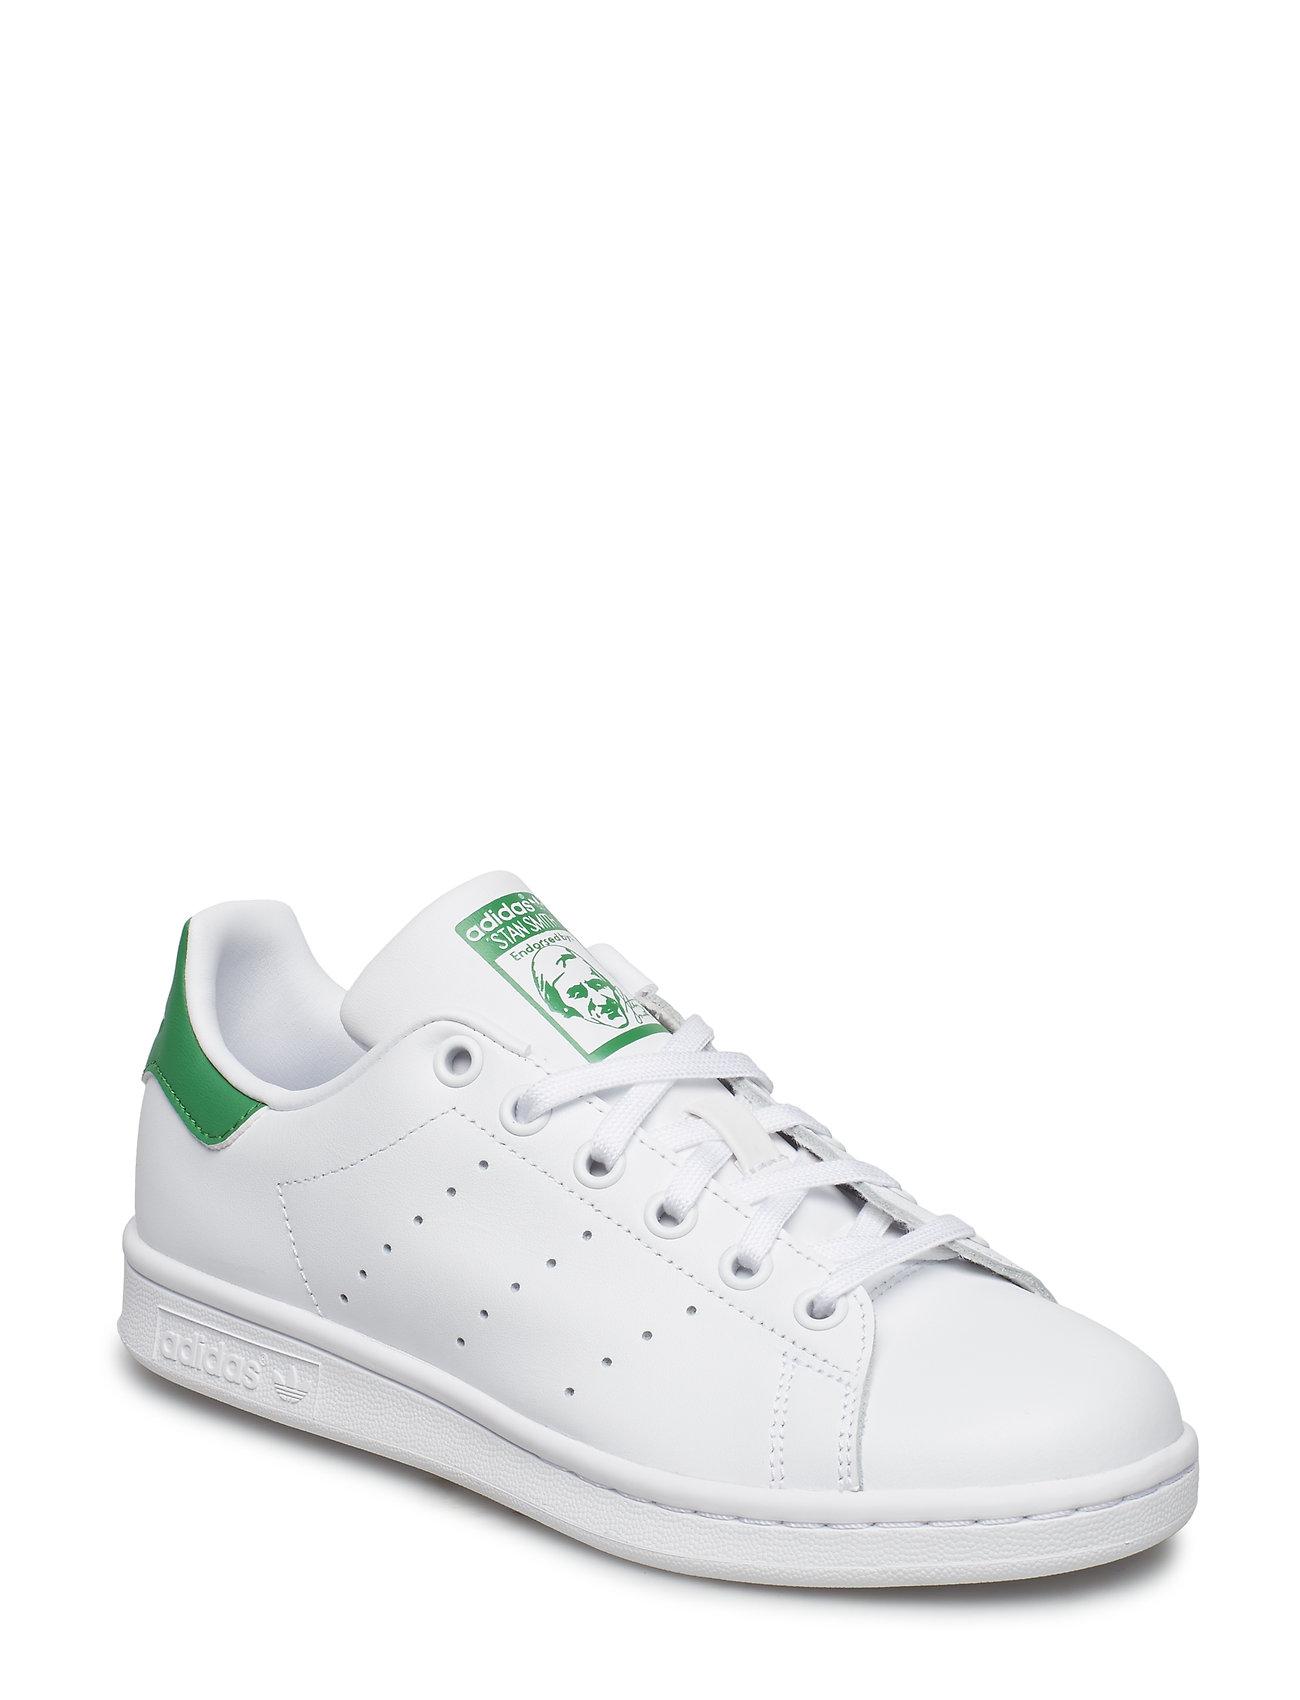 adidas Originals STAN SMITH J - FTWWHT/FTWWHT/GREEN